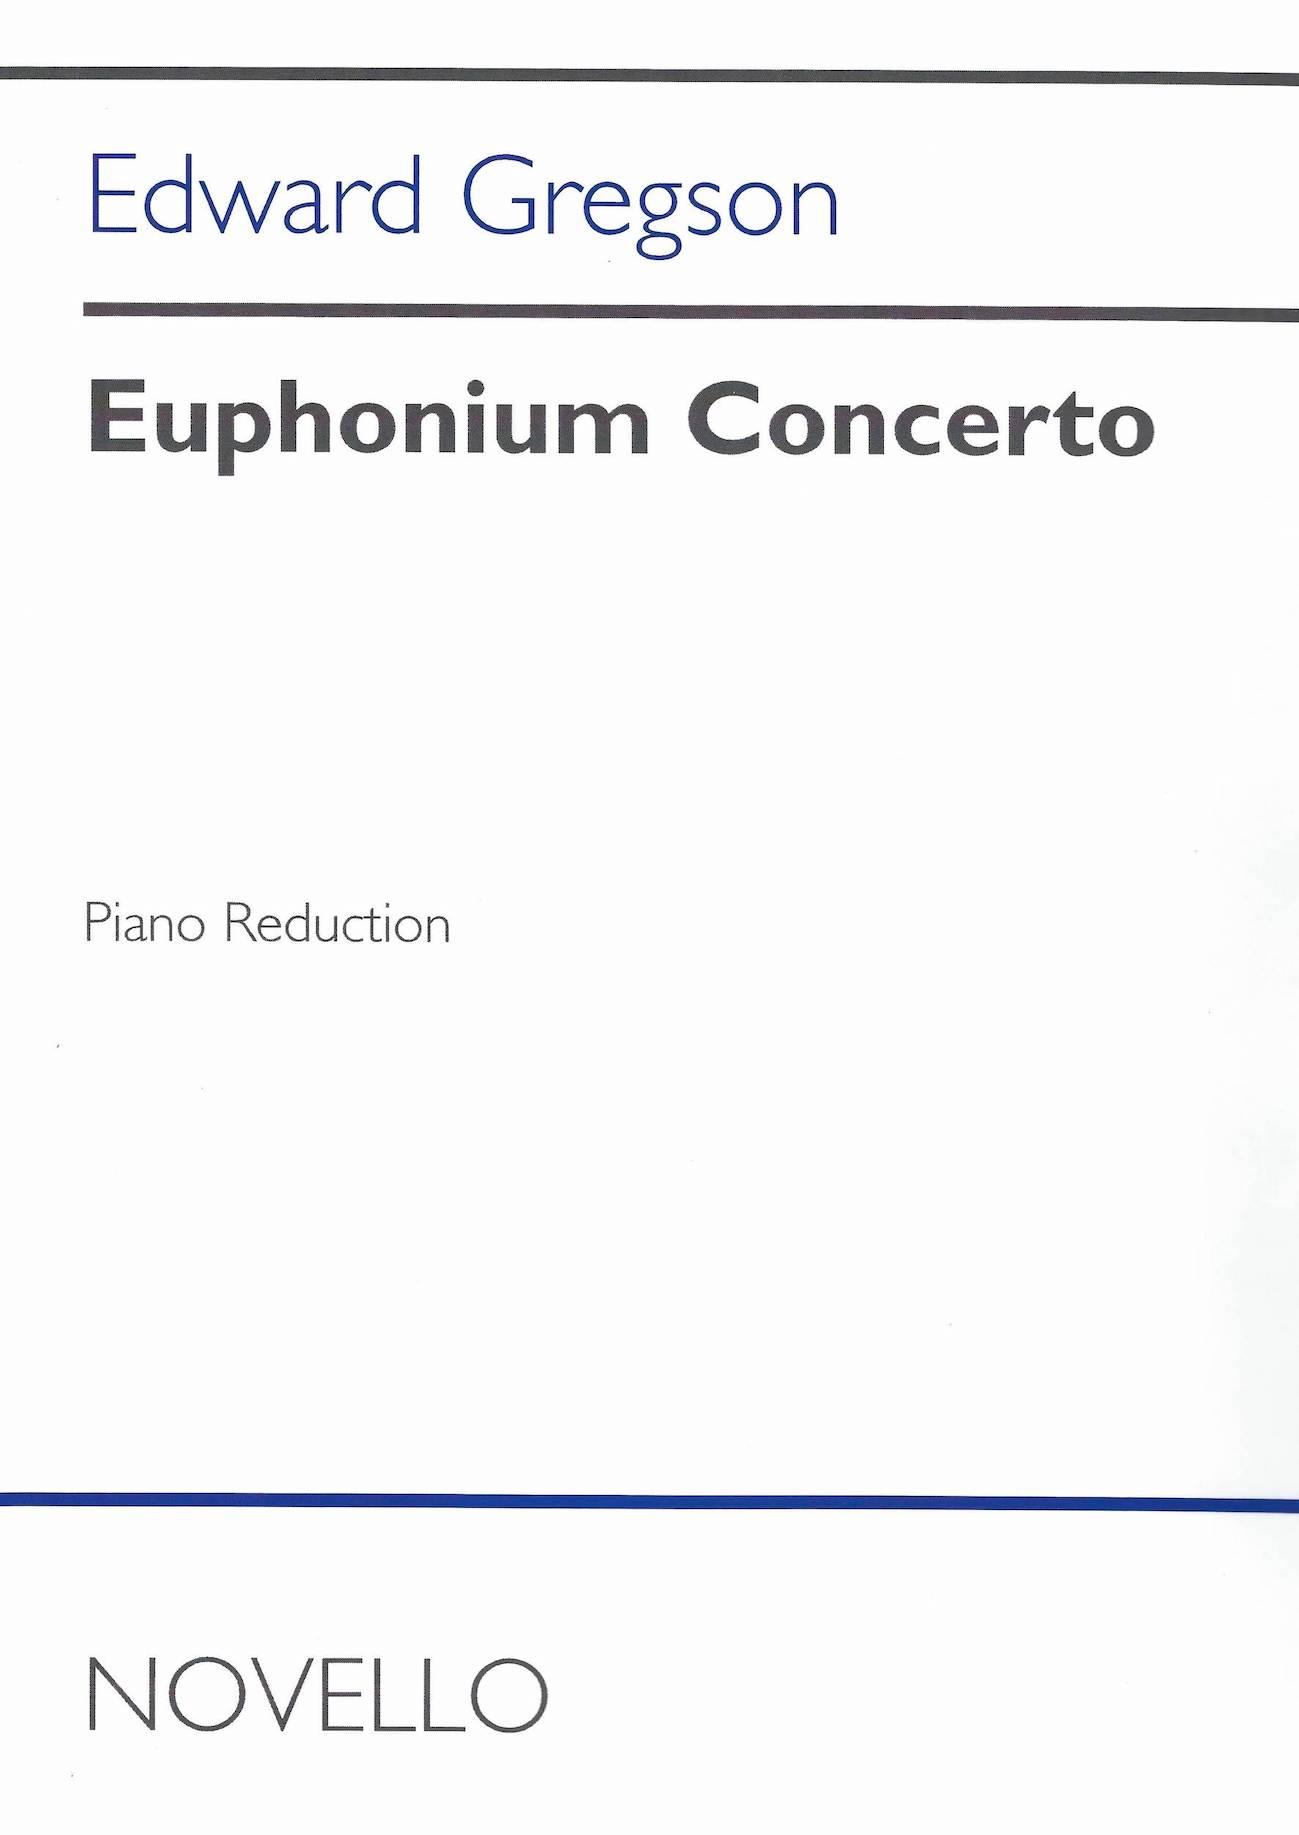 Euphonium Concerto - Edward Gregson - Euphonium and Piano